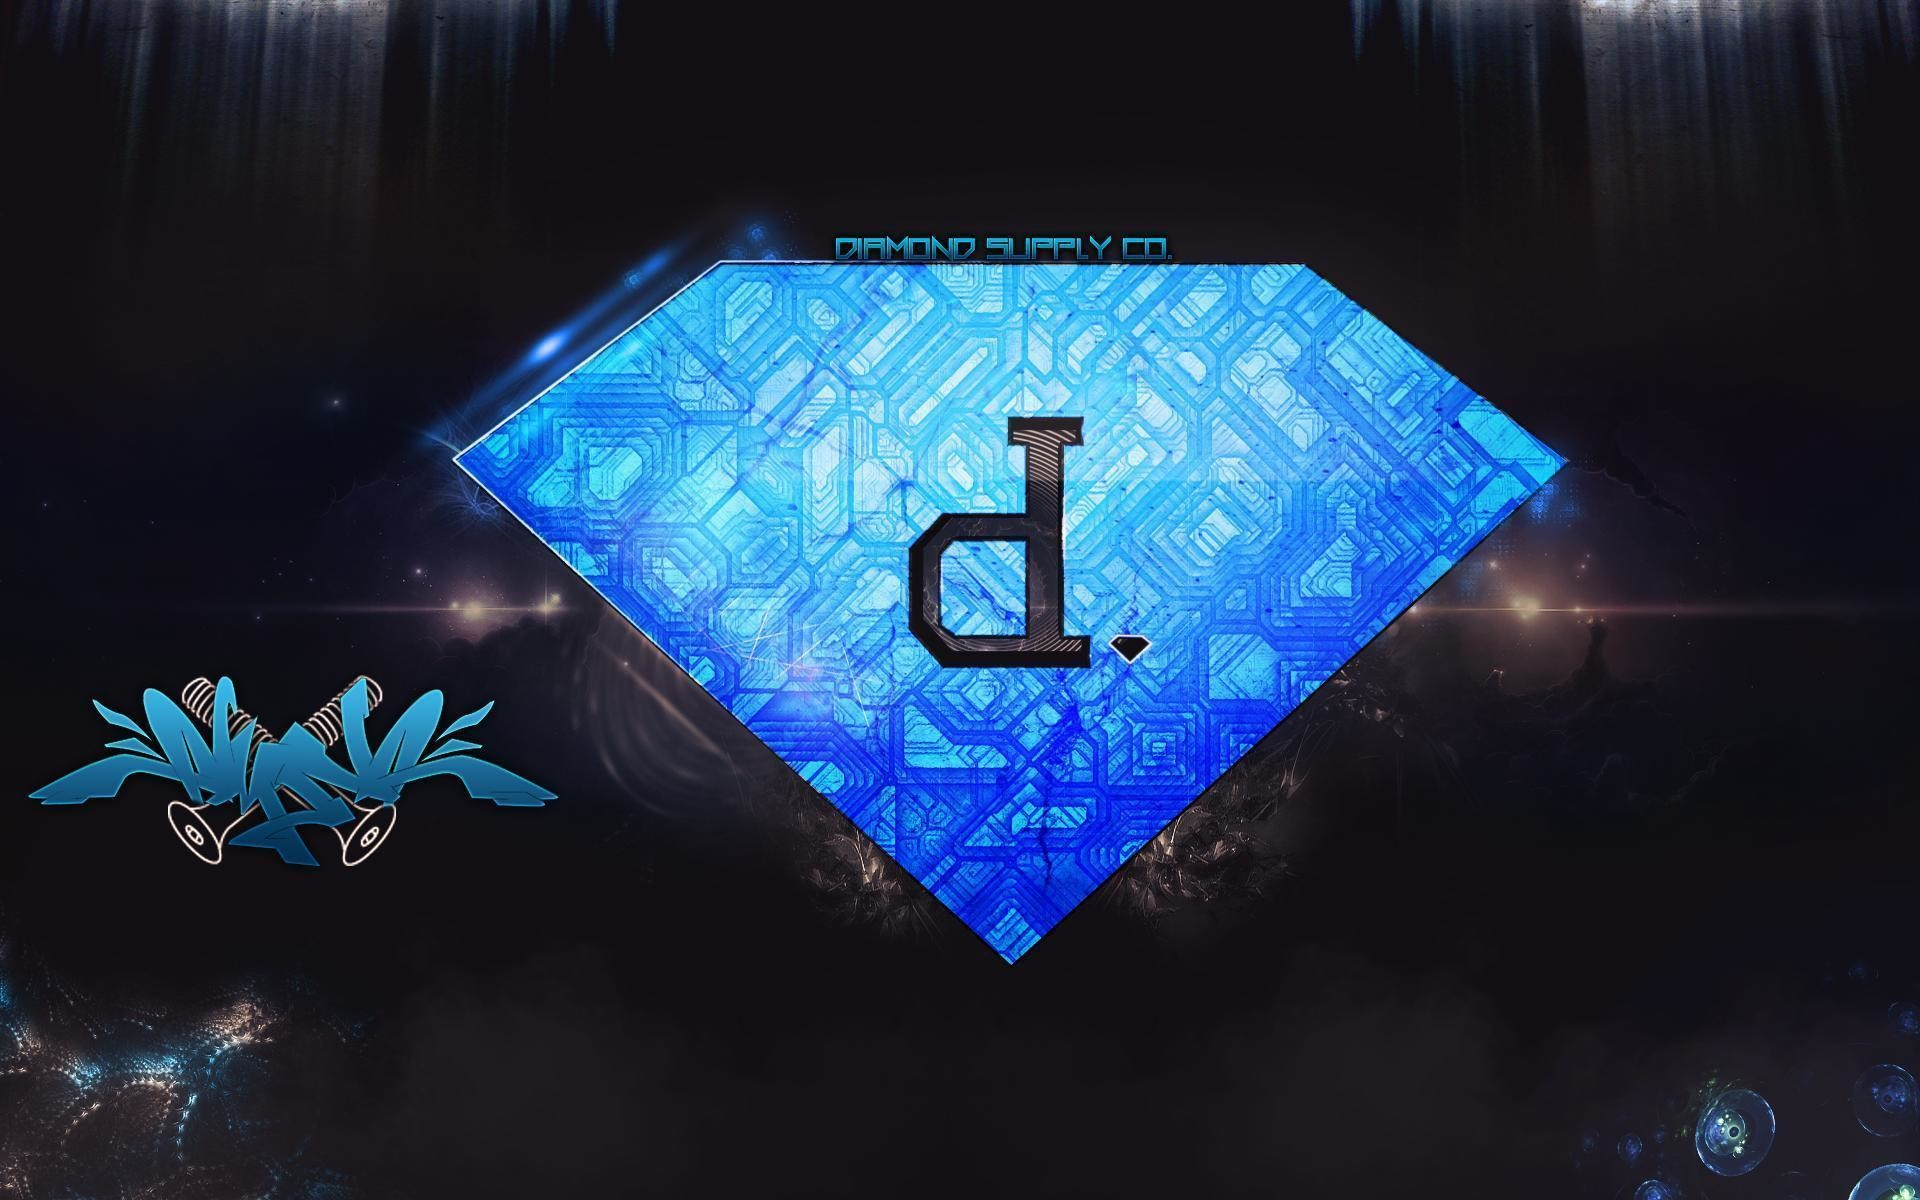 Diamond Supply Co. Wallpaper. by FlowDesiigns on DeviantArt